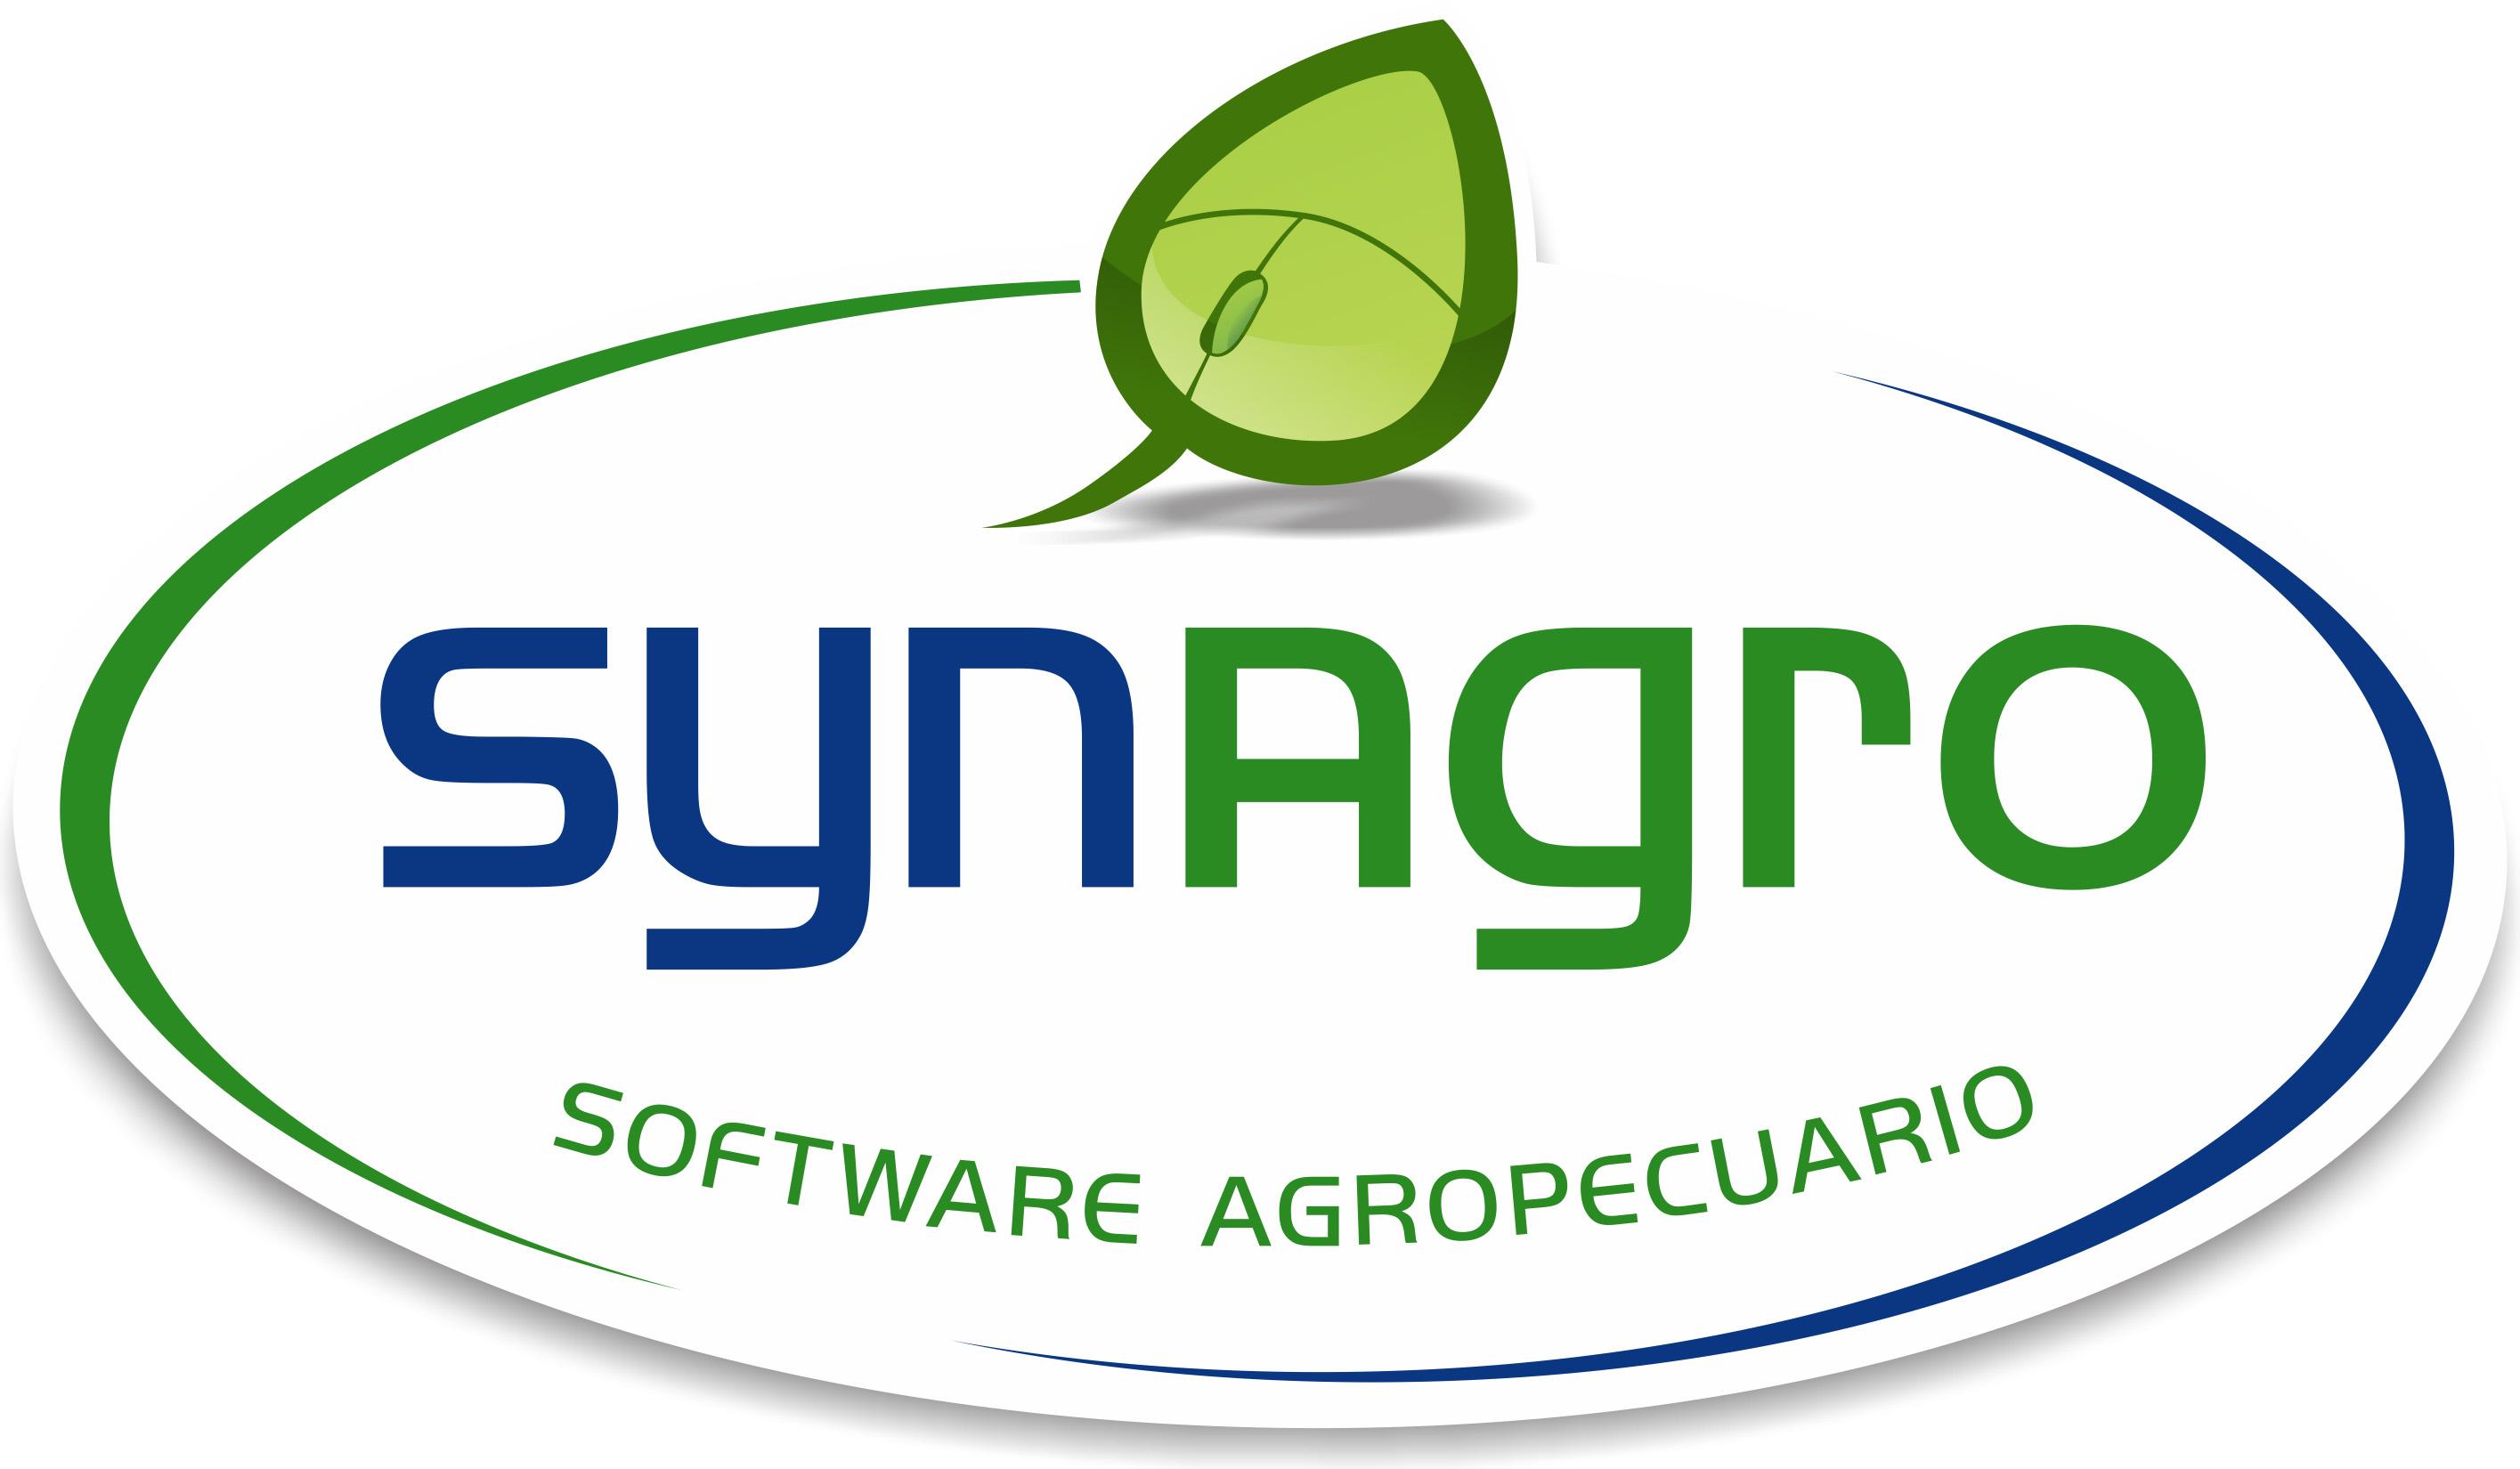 Synagro